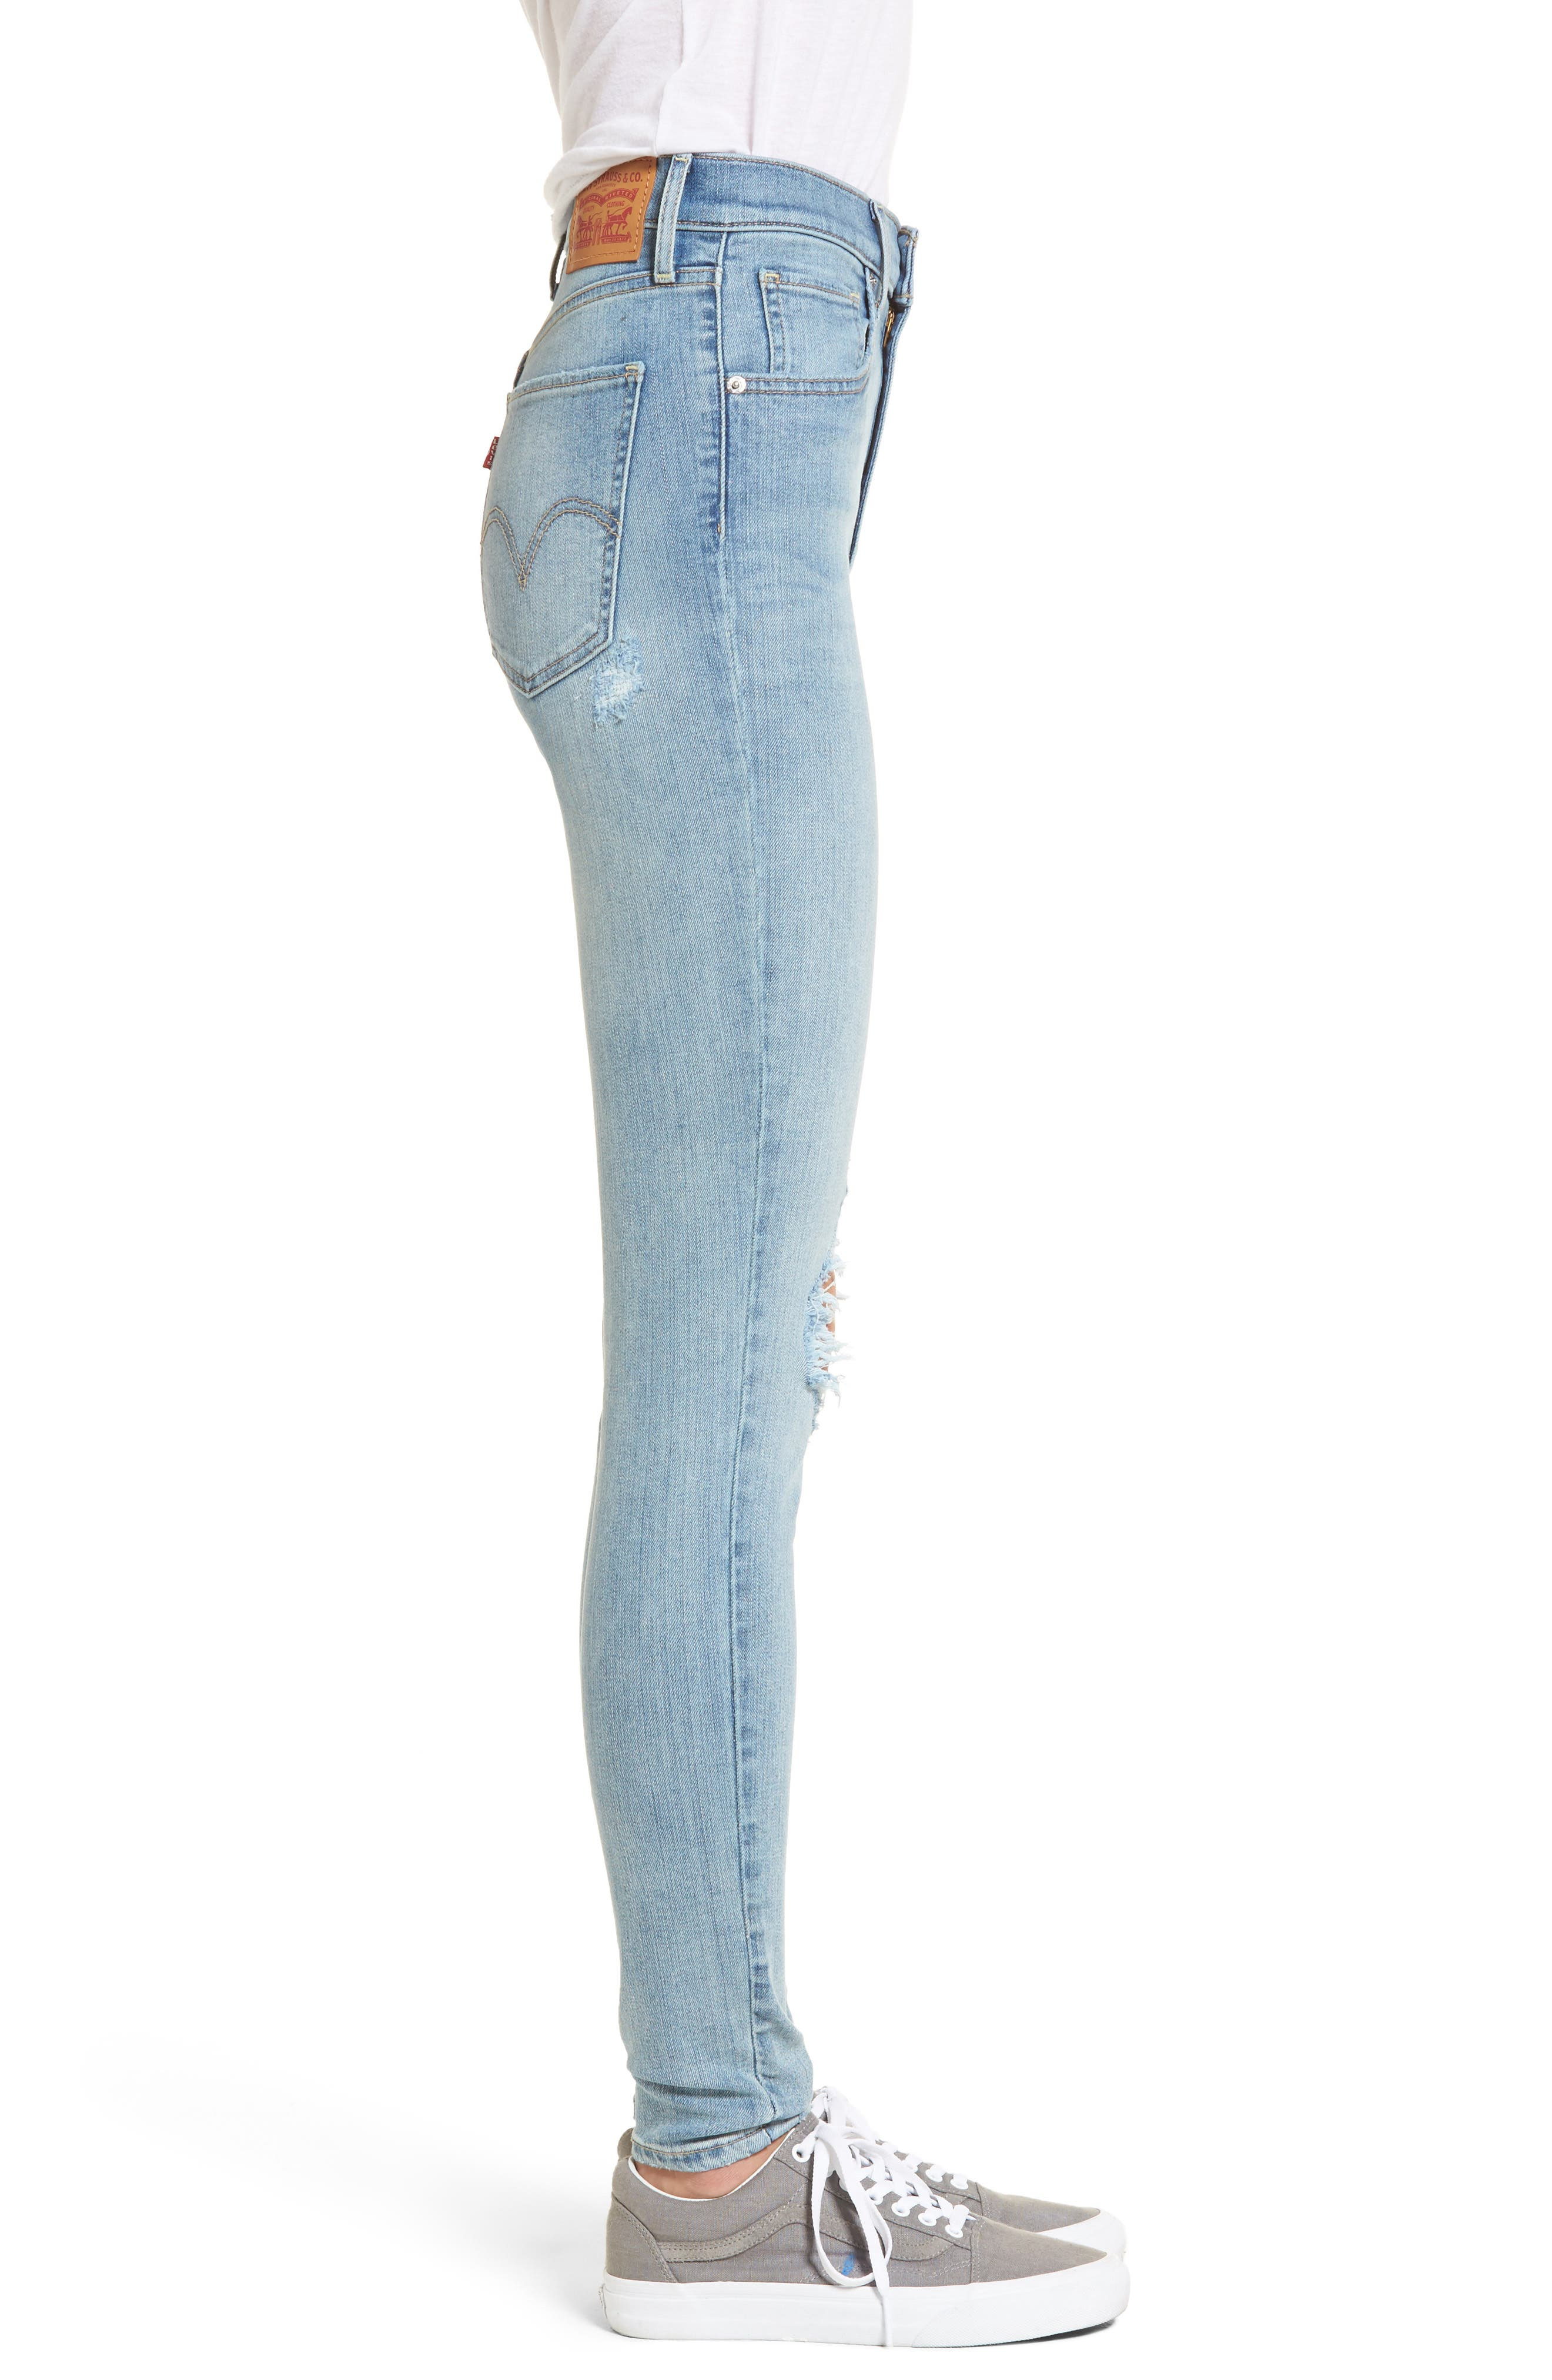 Mile High Super Skinny Jeans,                             Alternate thumbnail 3, color,                             Prime Time